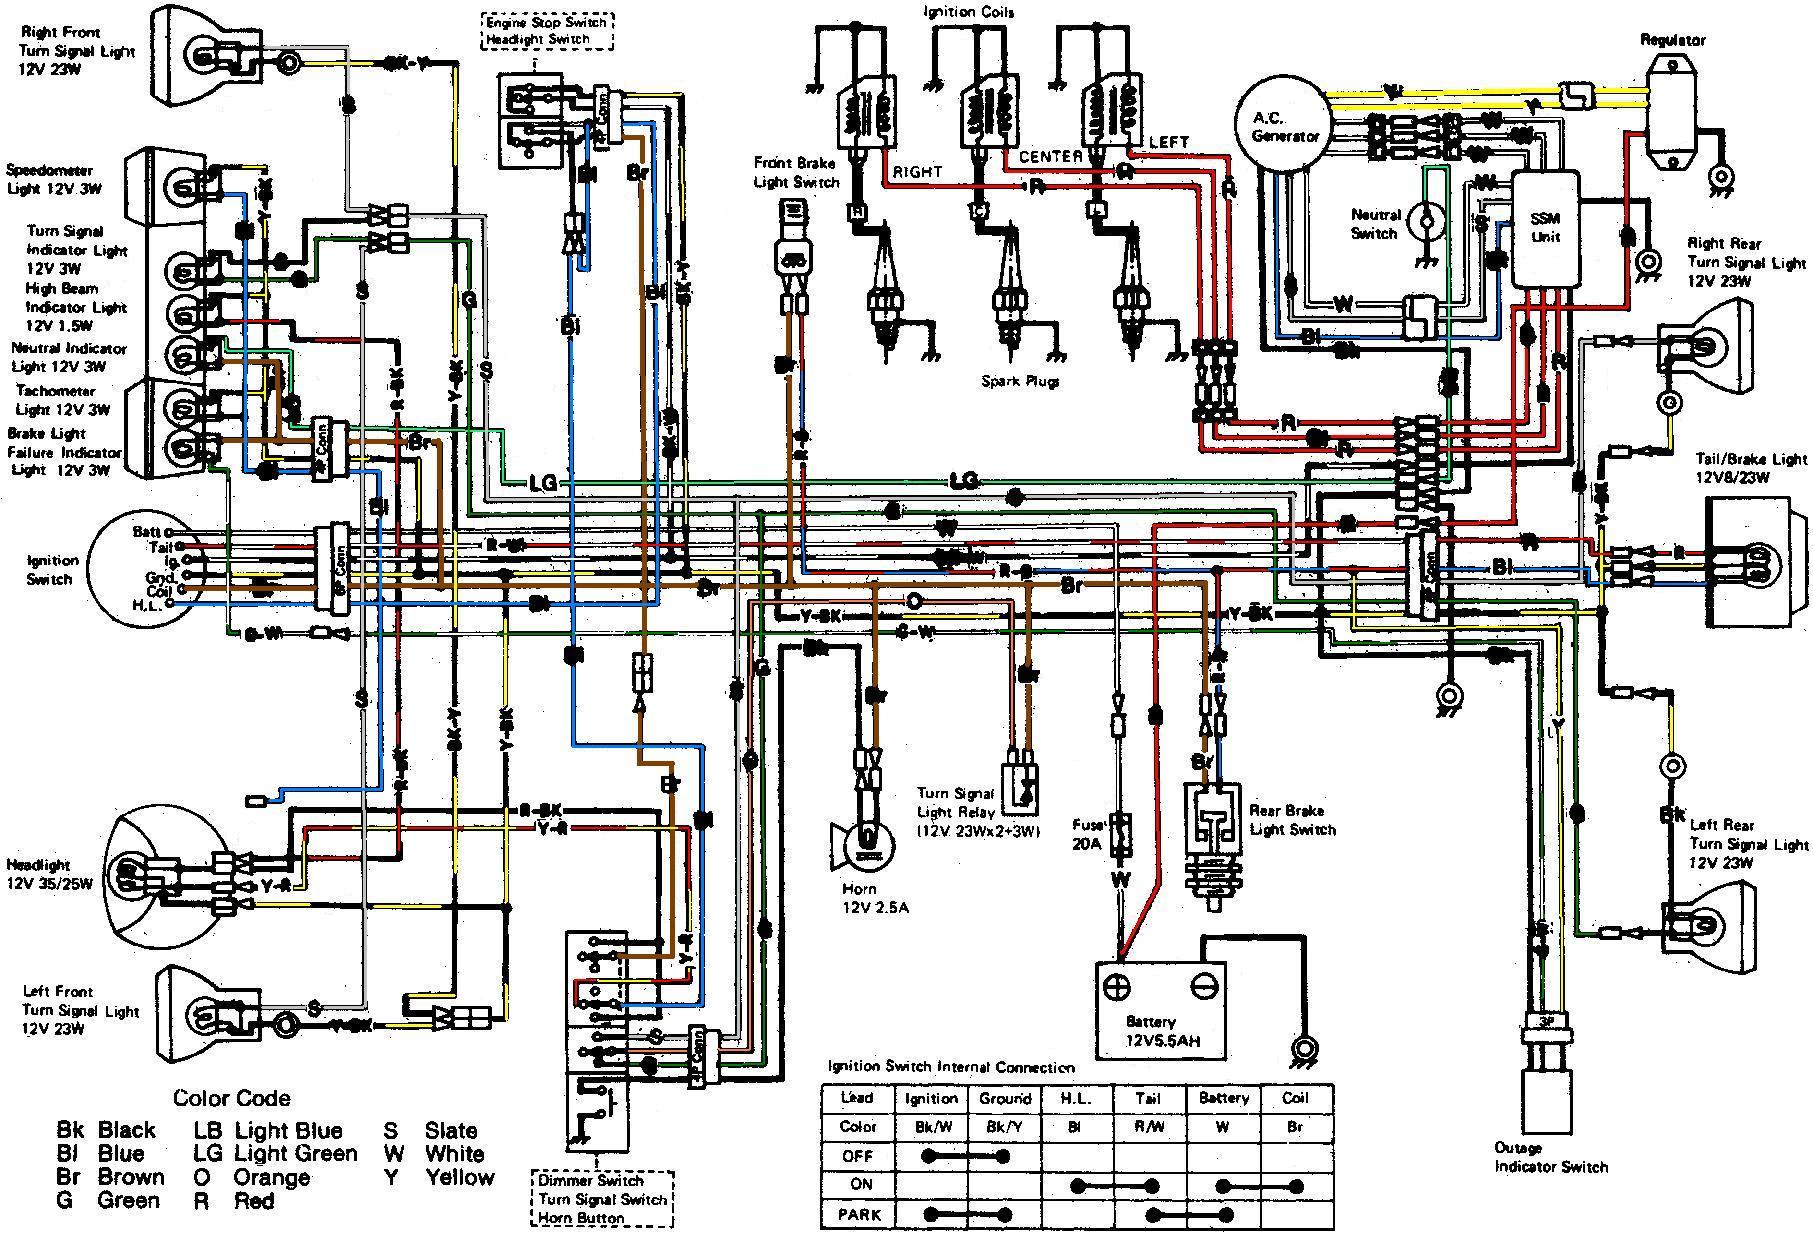 kawasaki klf220 wiring diagram 5 9 cummins fuel system kle 500 best library 1974 h1 schema diagrams rh 48 justanotherbeautyblog de